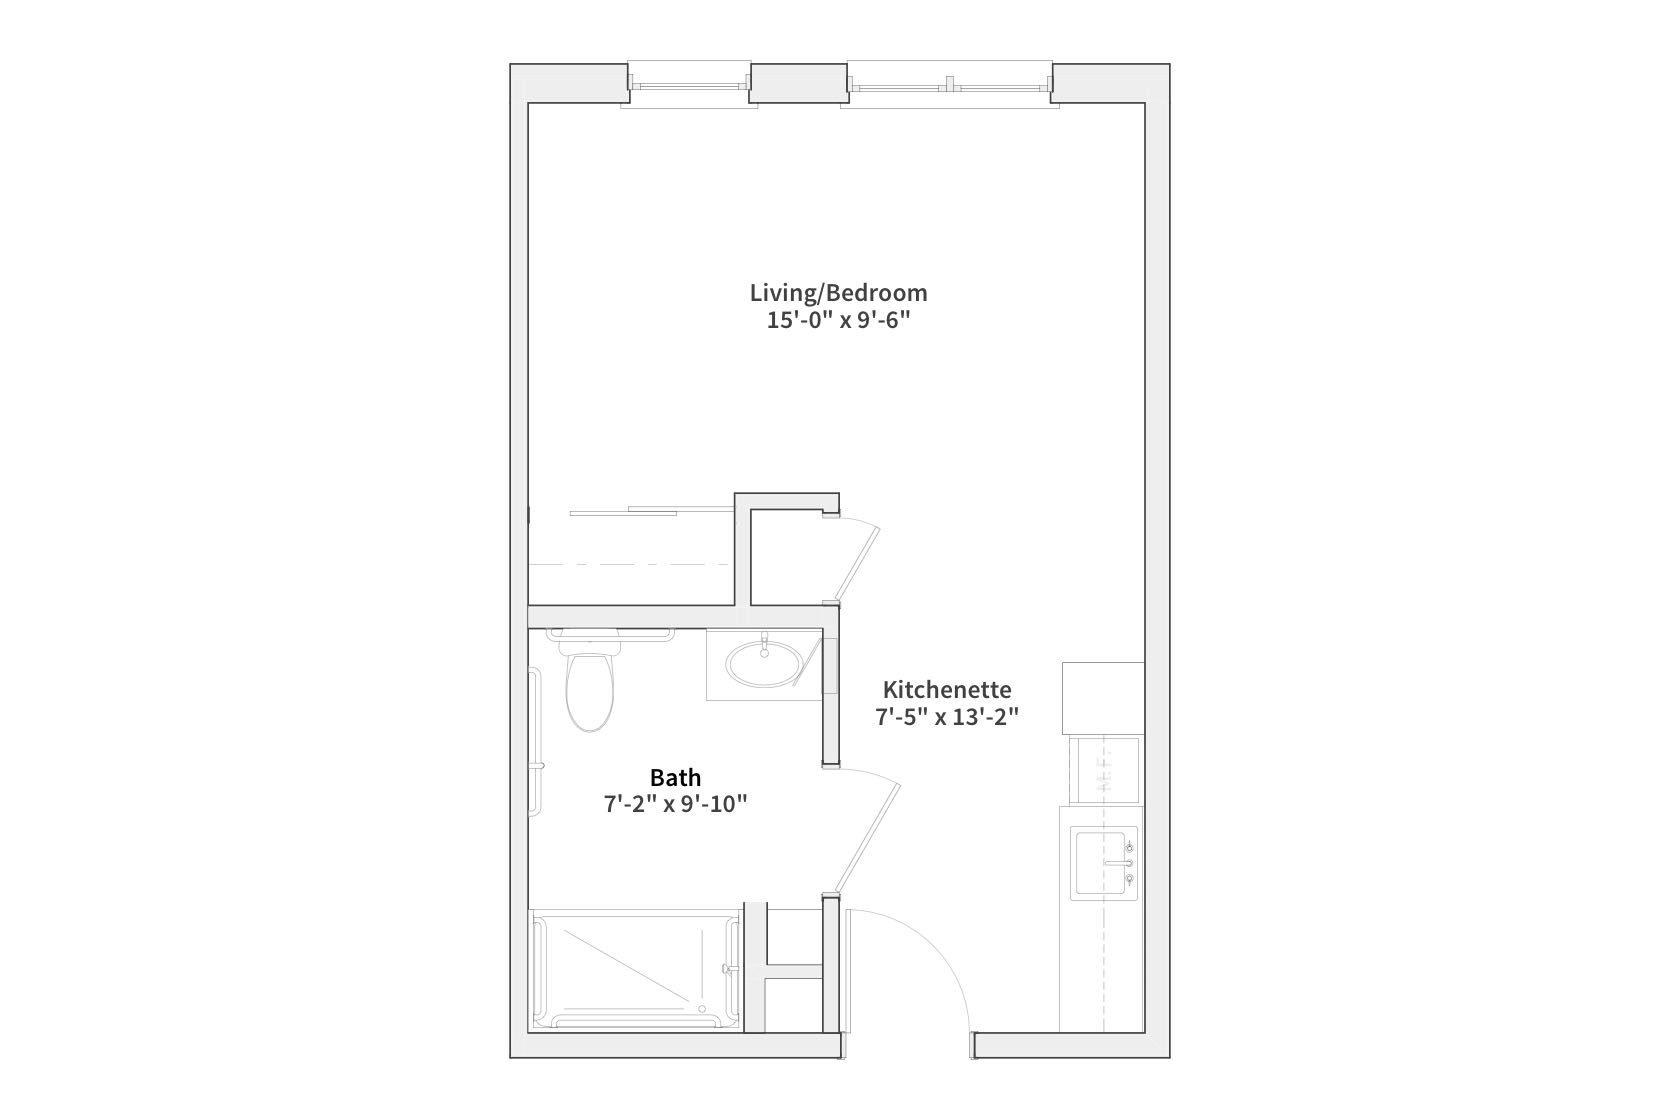 Silver Birch Michigan City studio floor plan